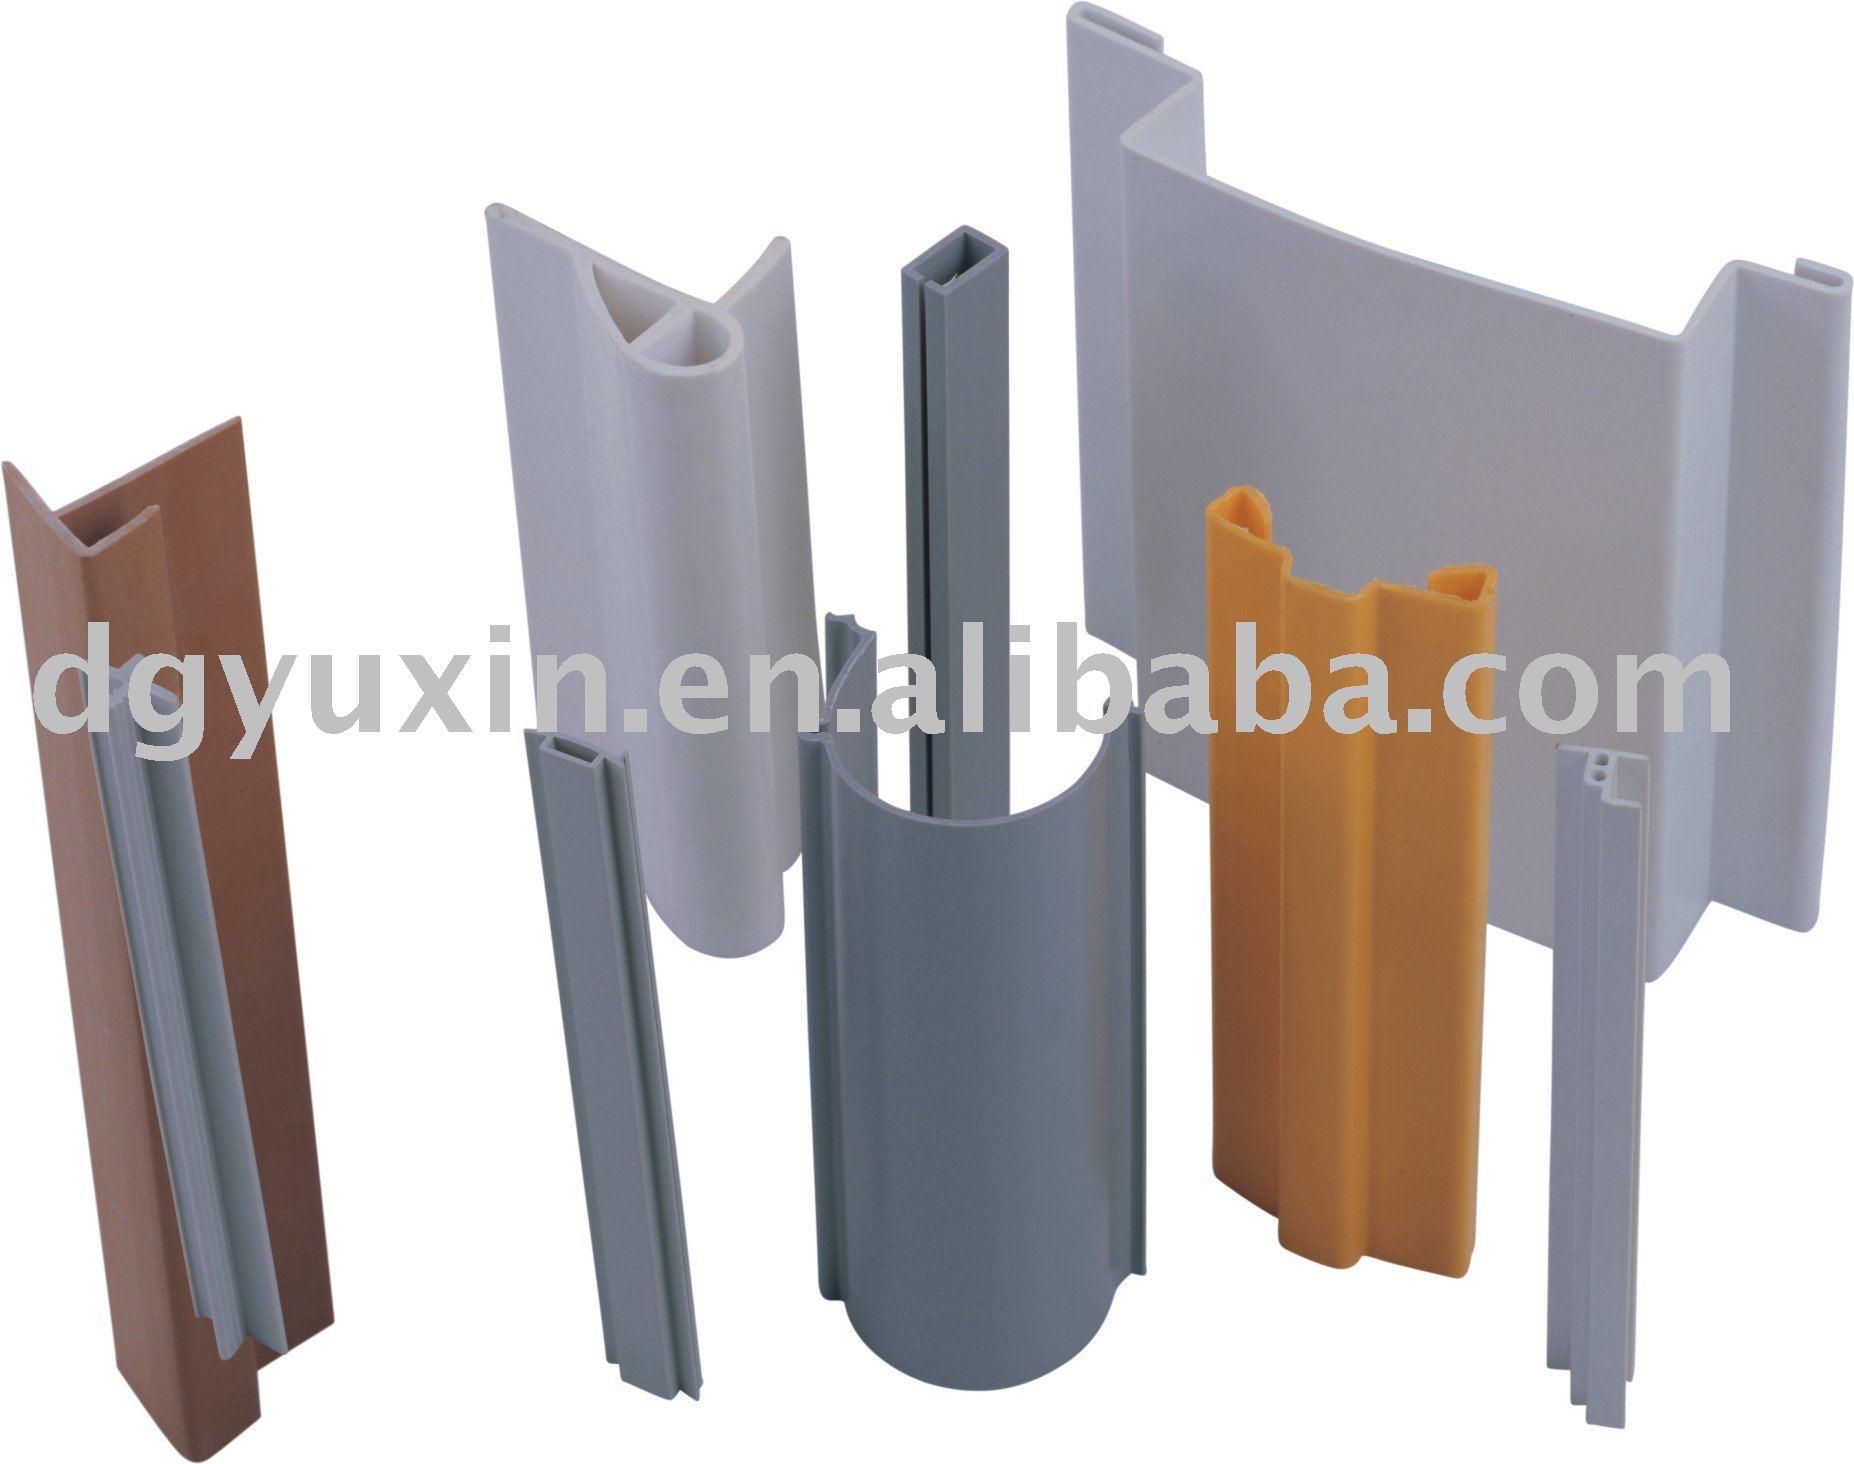 pc pe abs pmma pvc profiles plastic profile plastic. Black Bedroom Furniture Sets. Home Design Ideas